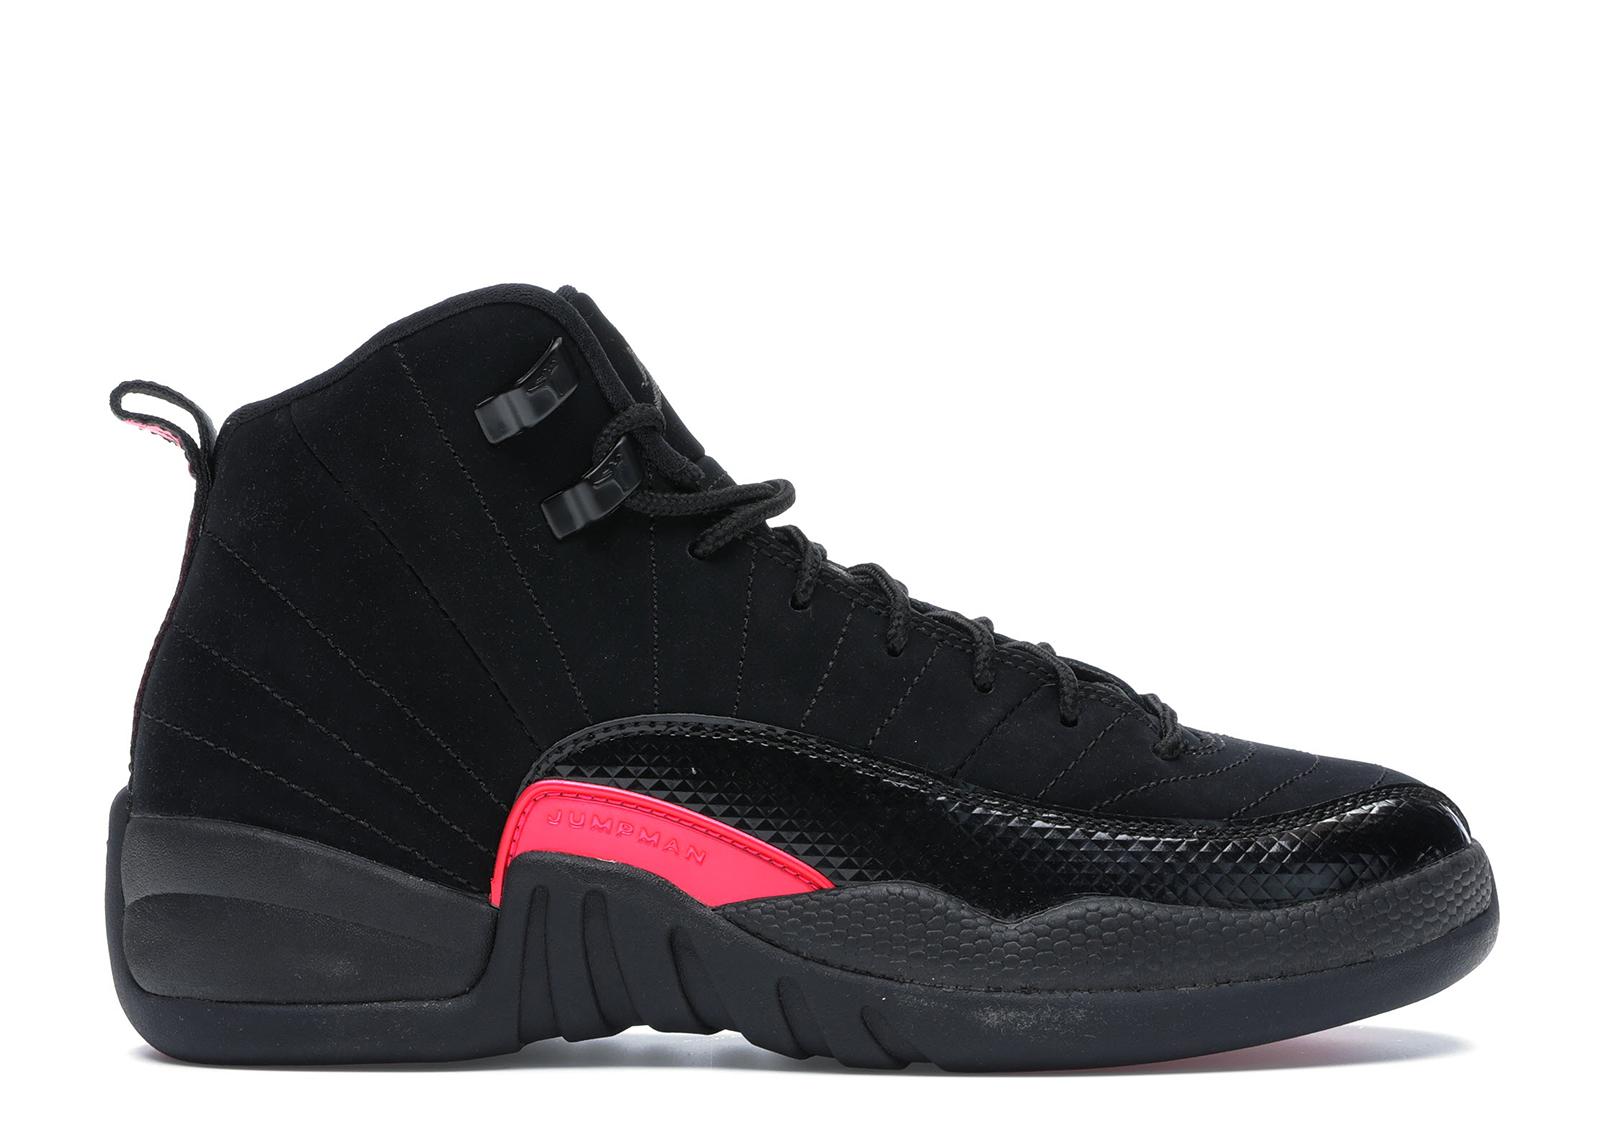 Jordan 12 Retro Black Rush Pink (GS